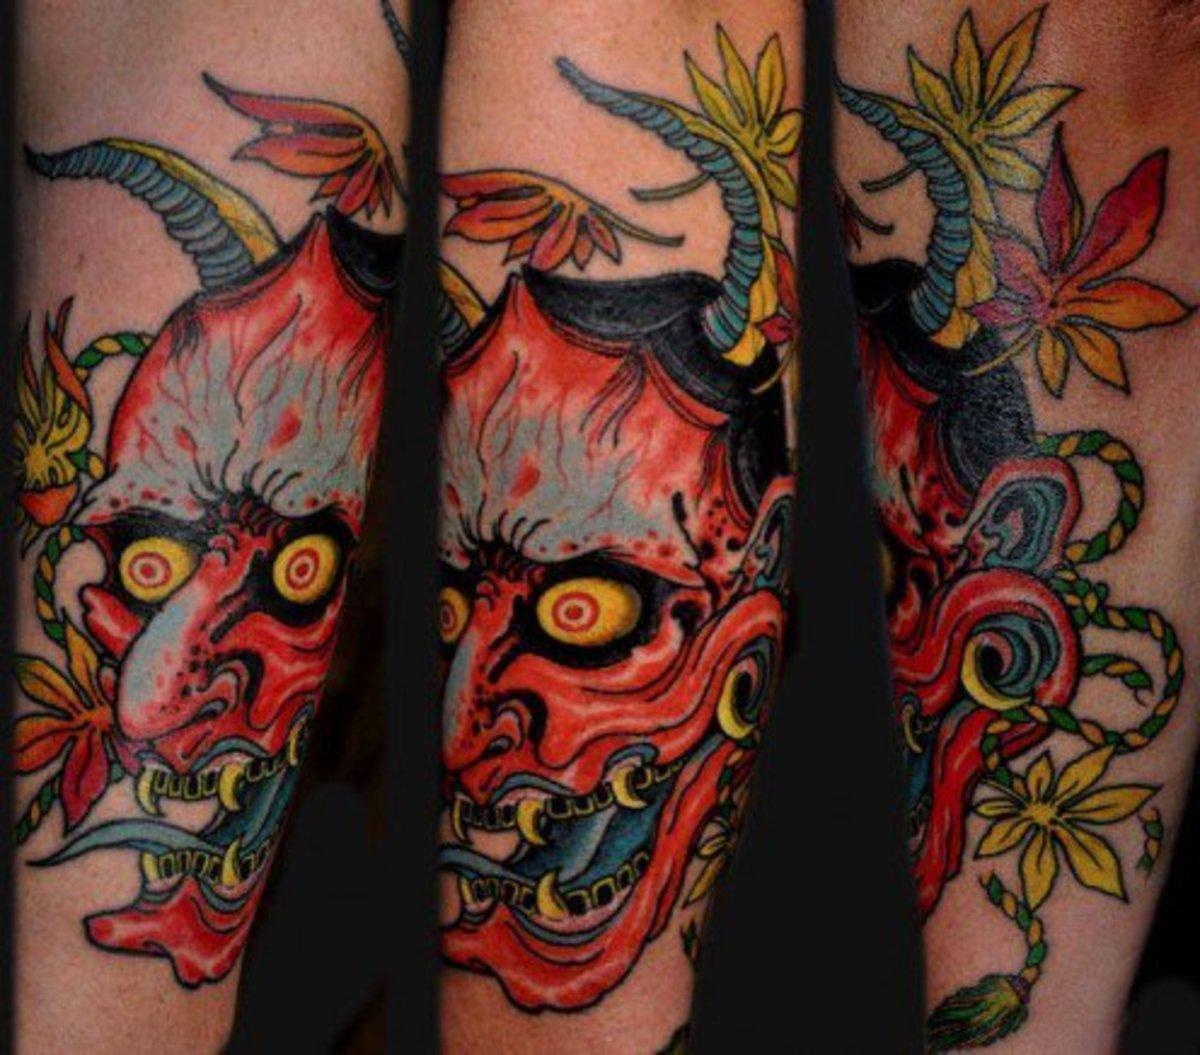 3f827de99 Japanese Hannya Tattoos: Origins, Meanings & Ideas | TatRing